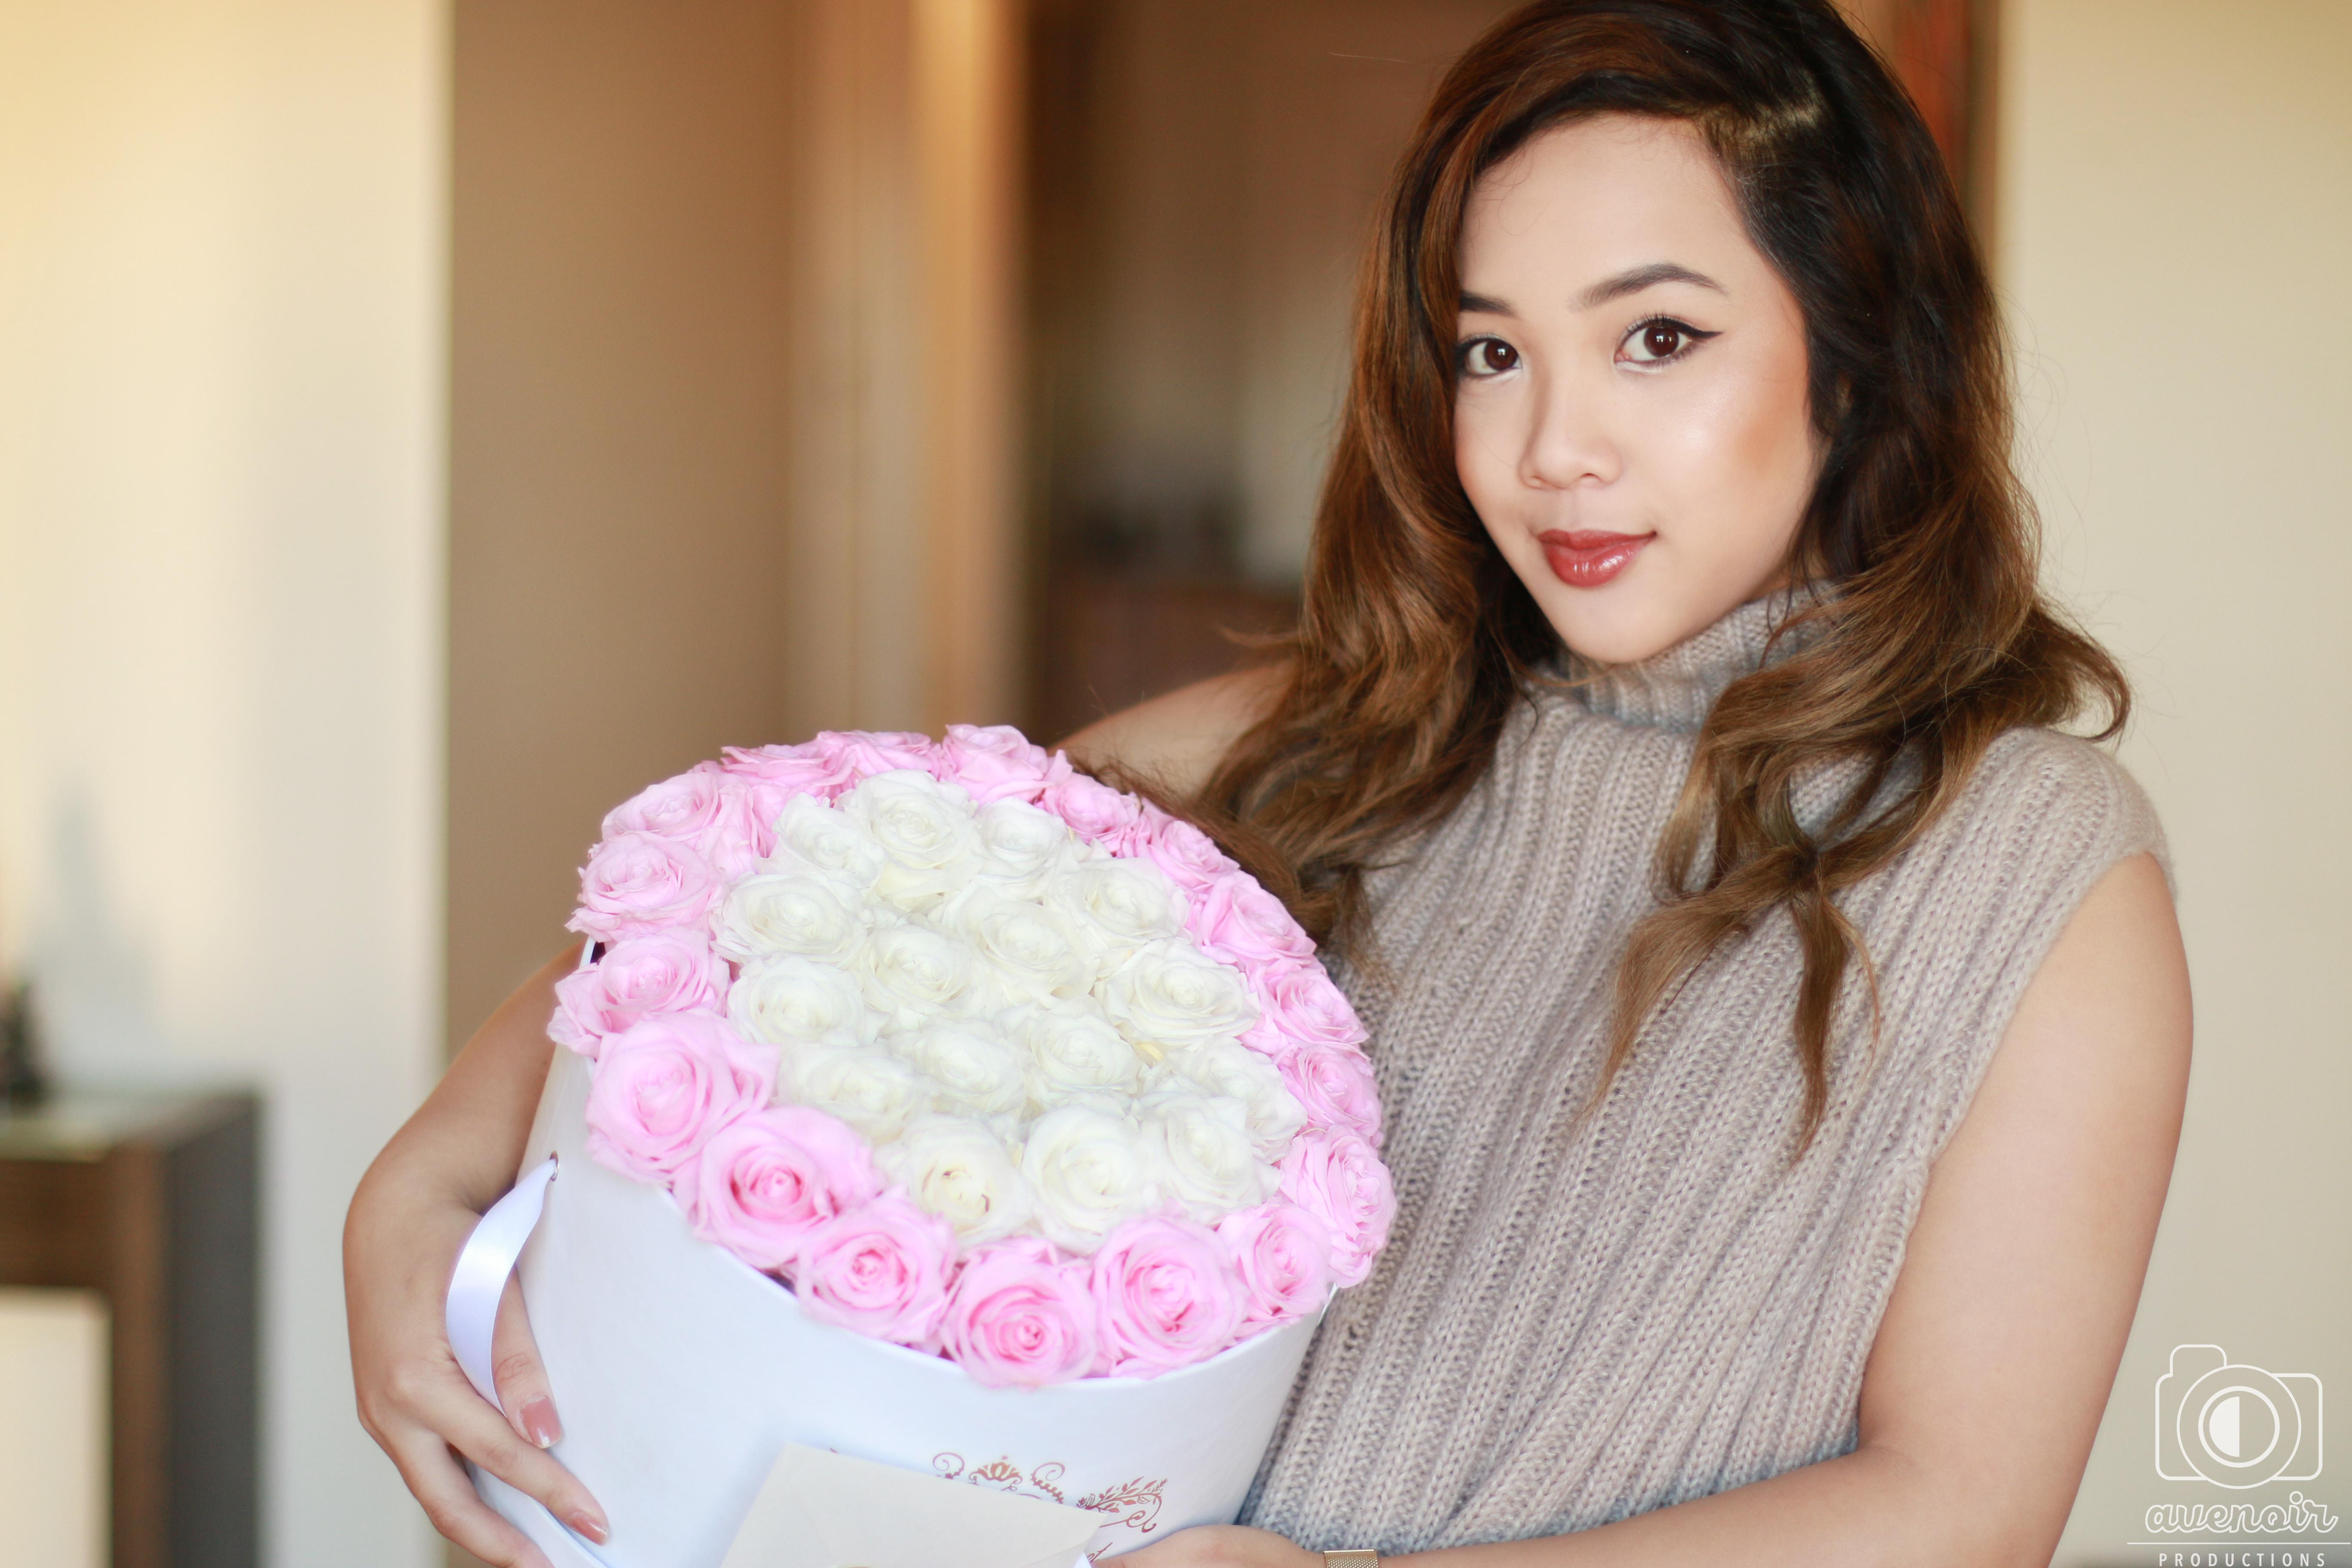 A Lasting Bouquet